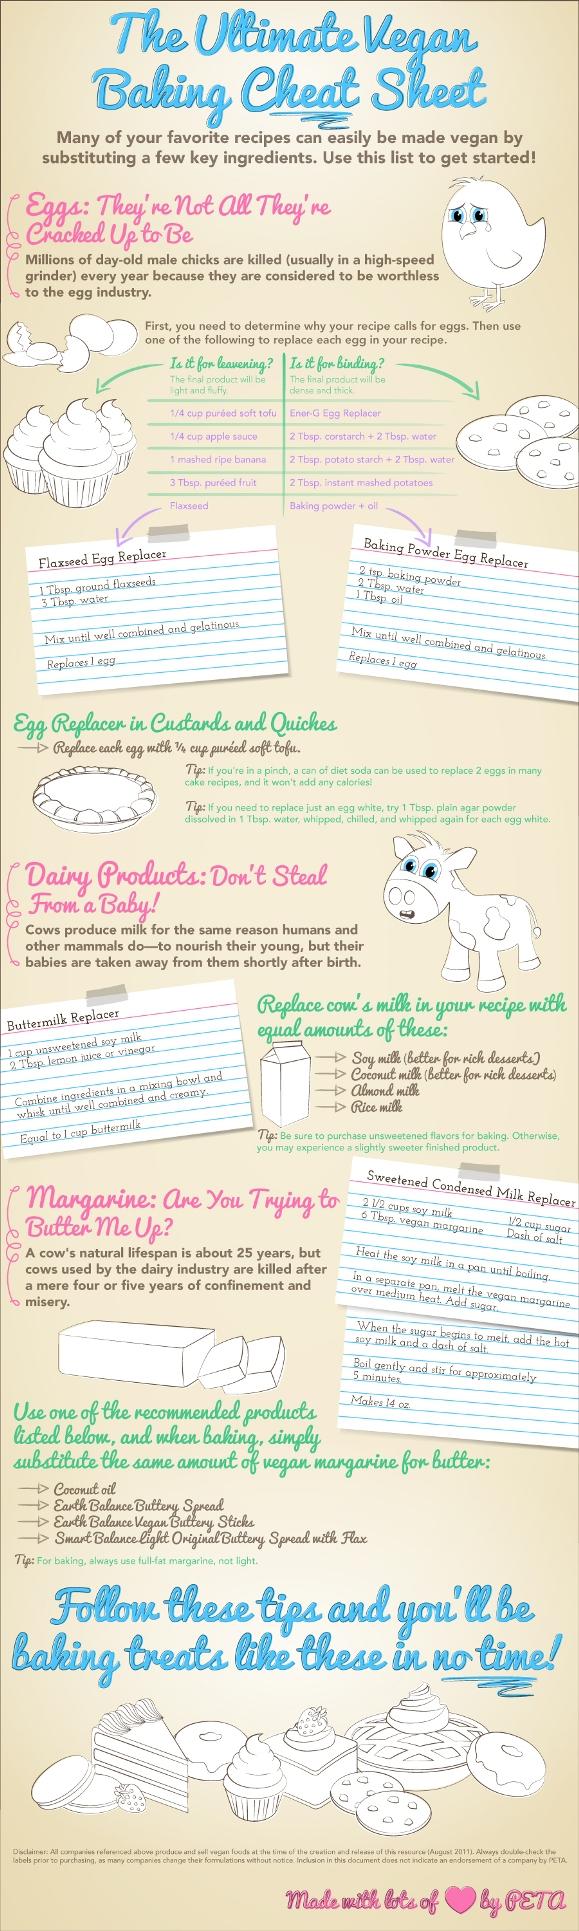 Egg Substitutes - My Vegan Journal